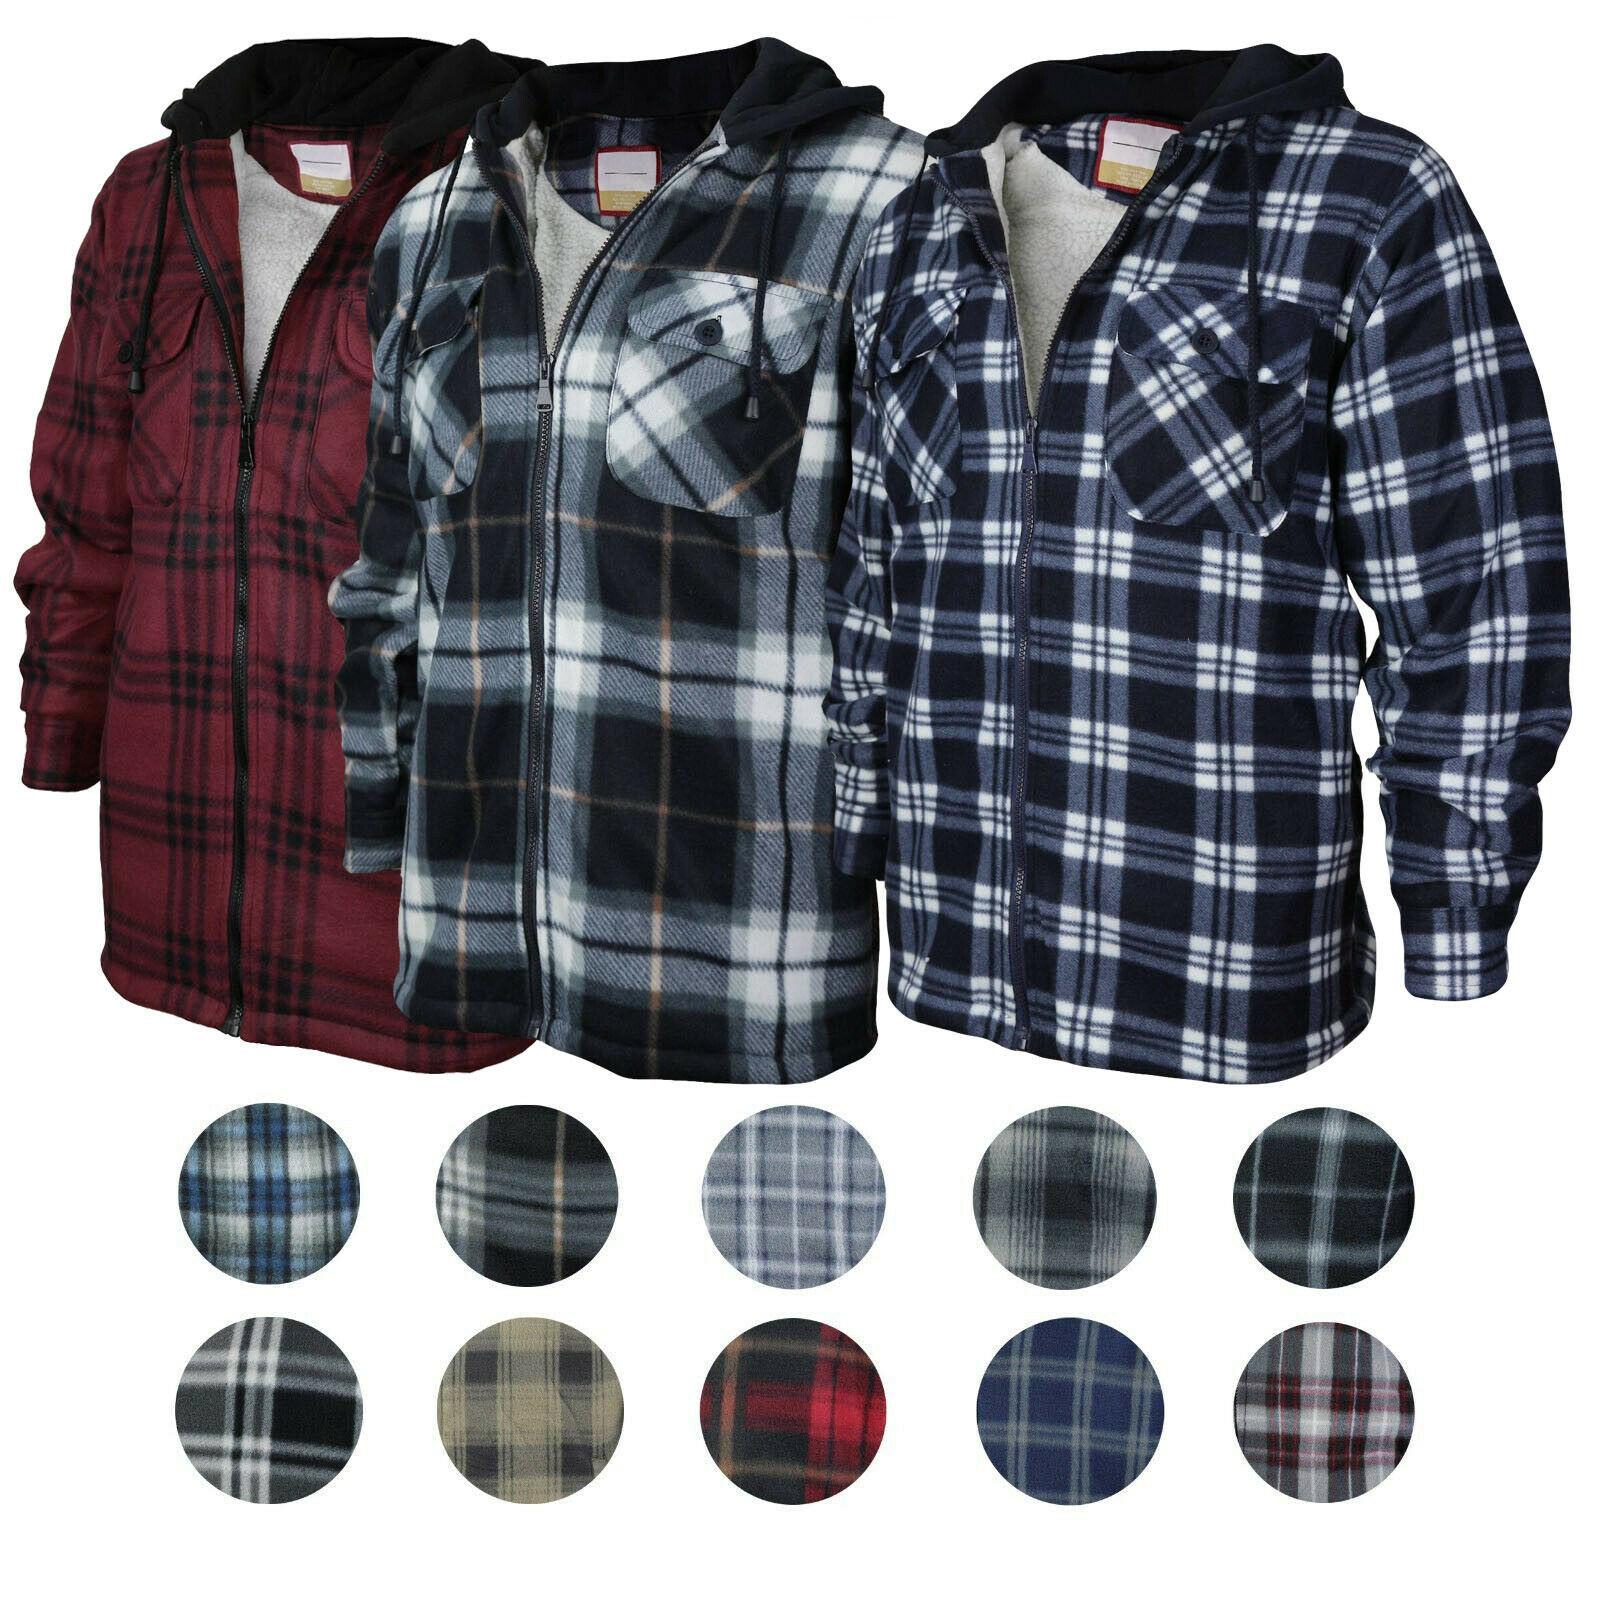 Men's Heavyweight Flannel Zip Up Fleece Lined Plaid Sherpa Hoodie Jacket